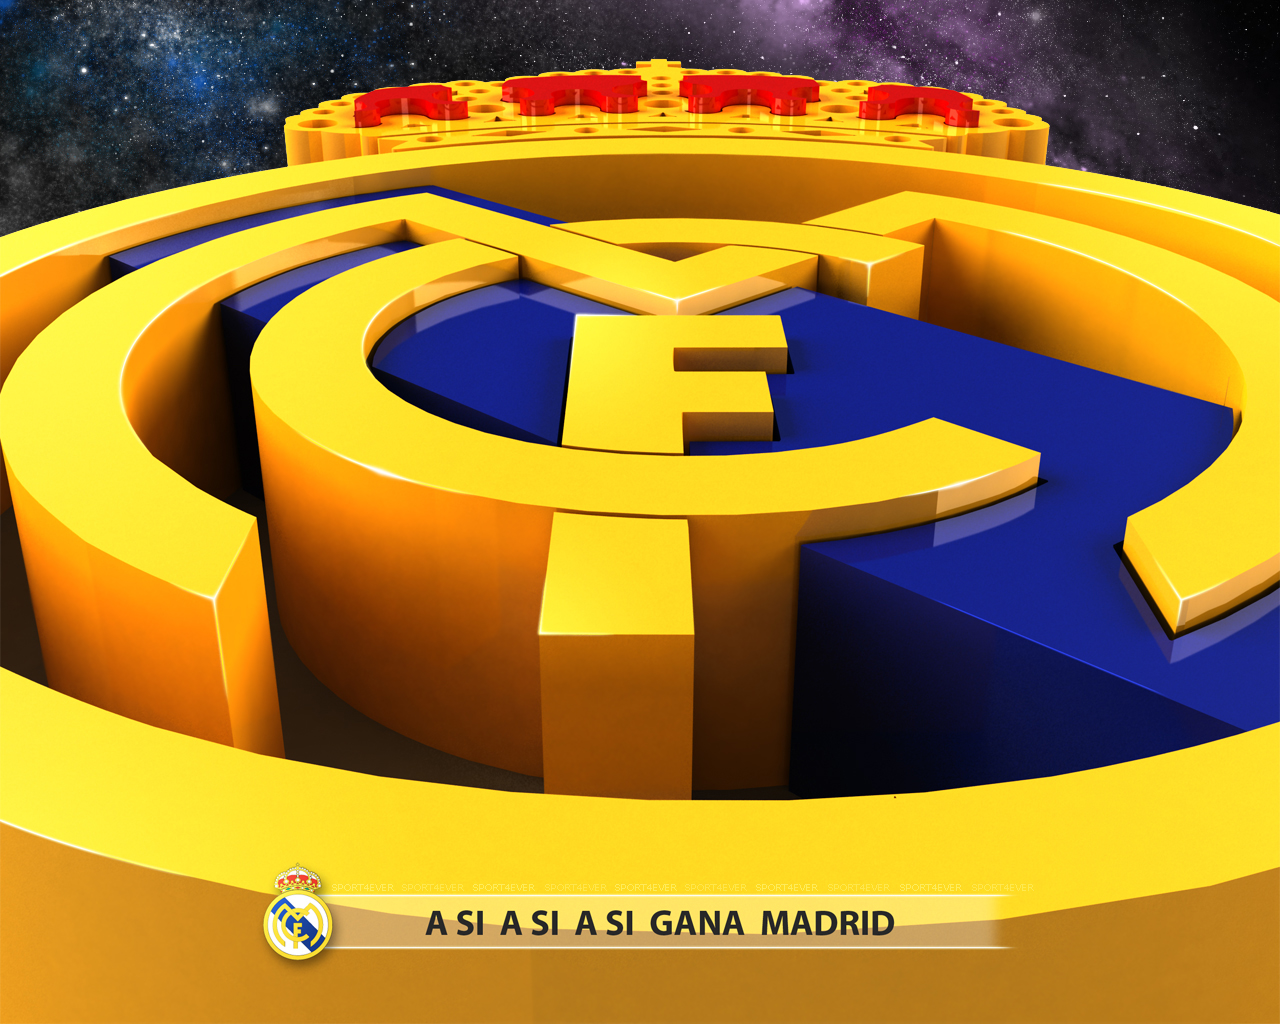 Historia del Real Madrid | History of Real Madrid - YouTube